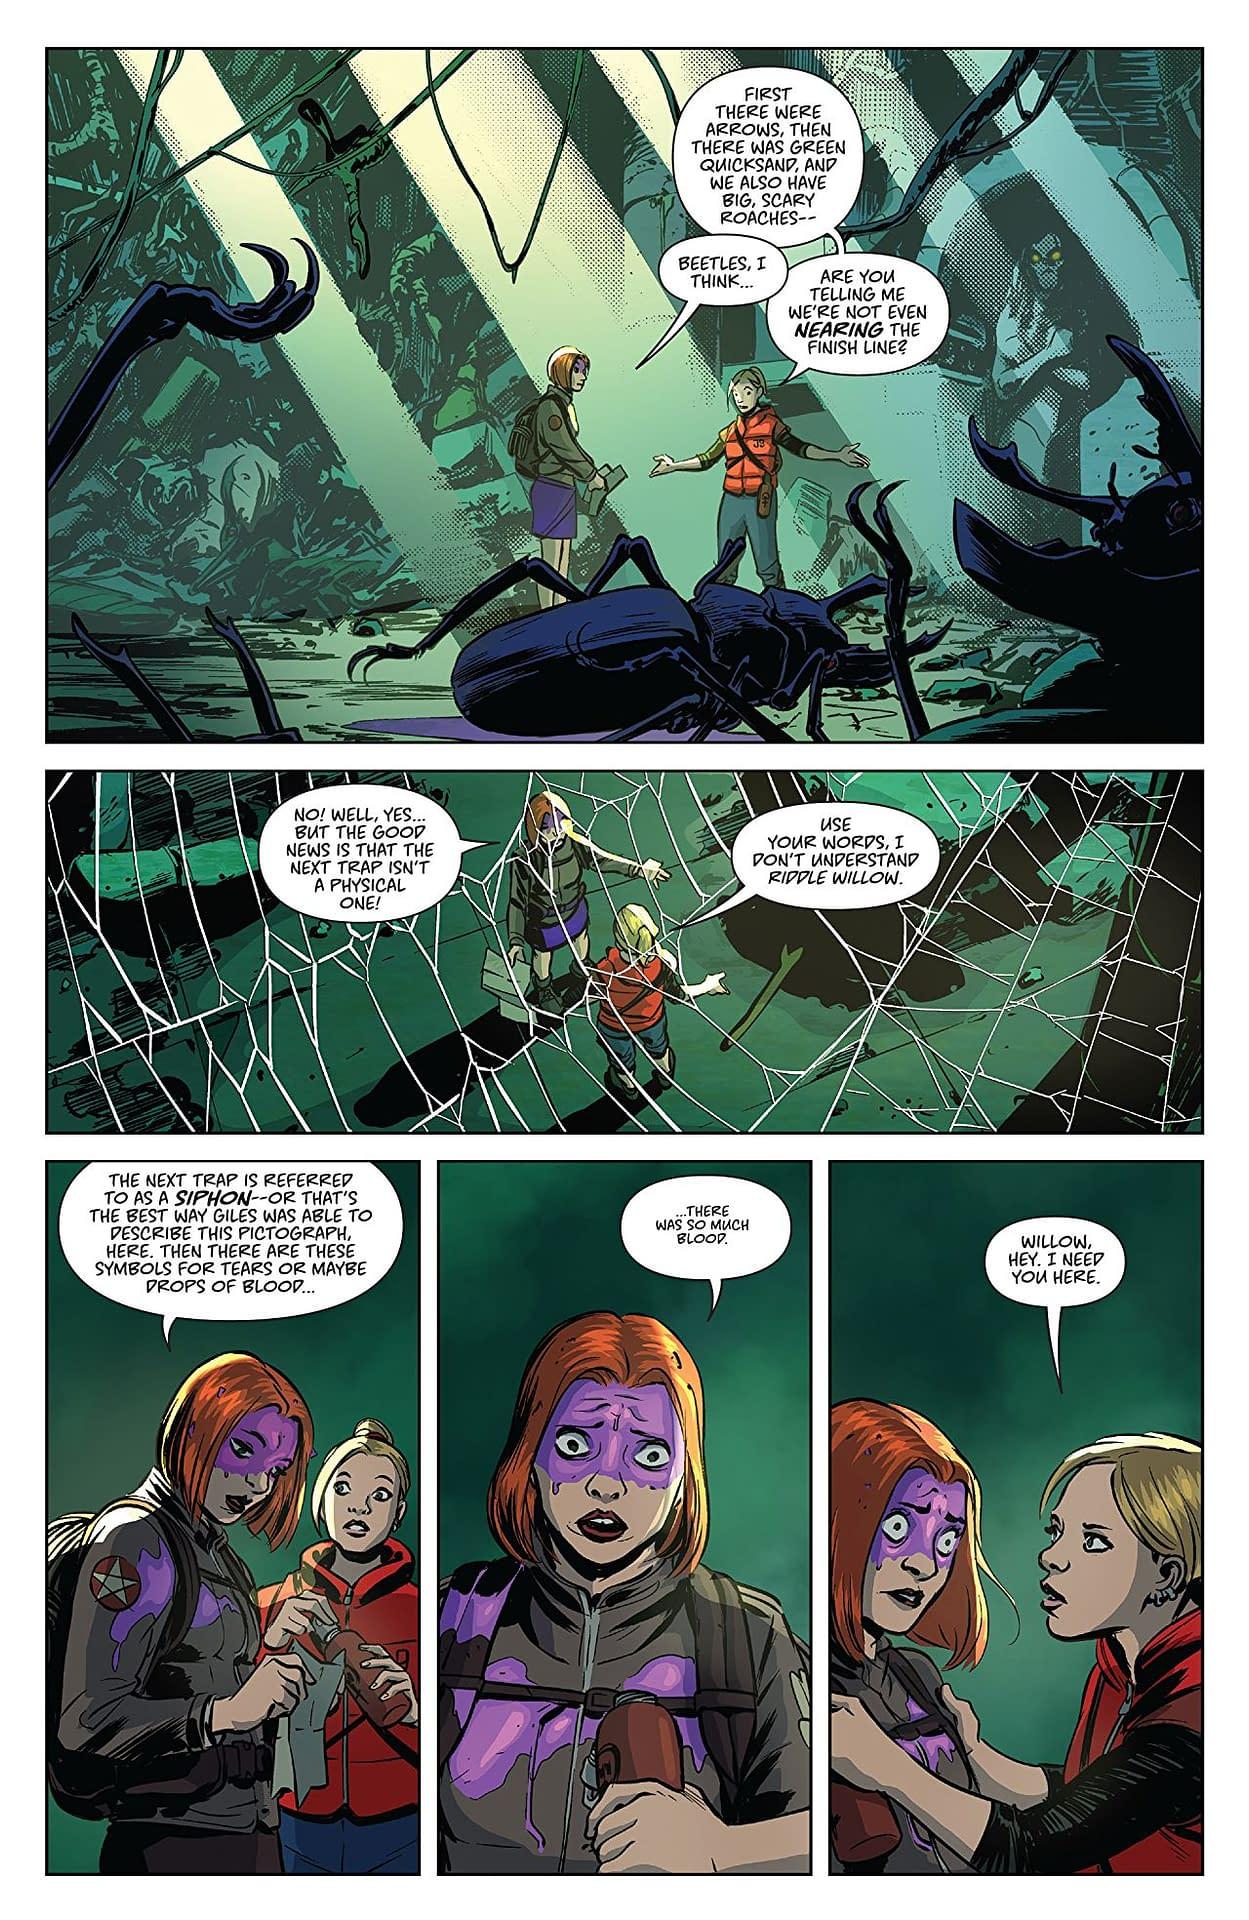 """Buffy The Vampire Slayer"" # 6, BOOM! Studios"